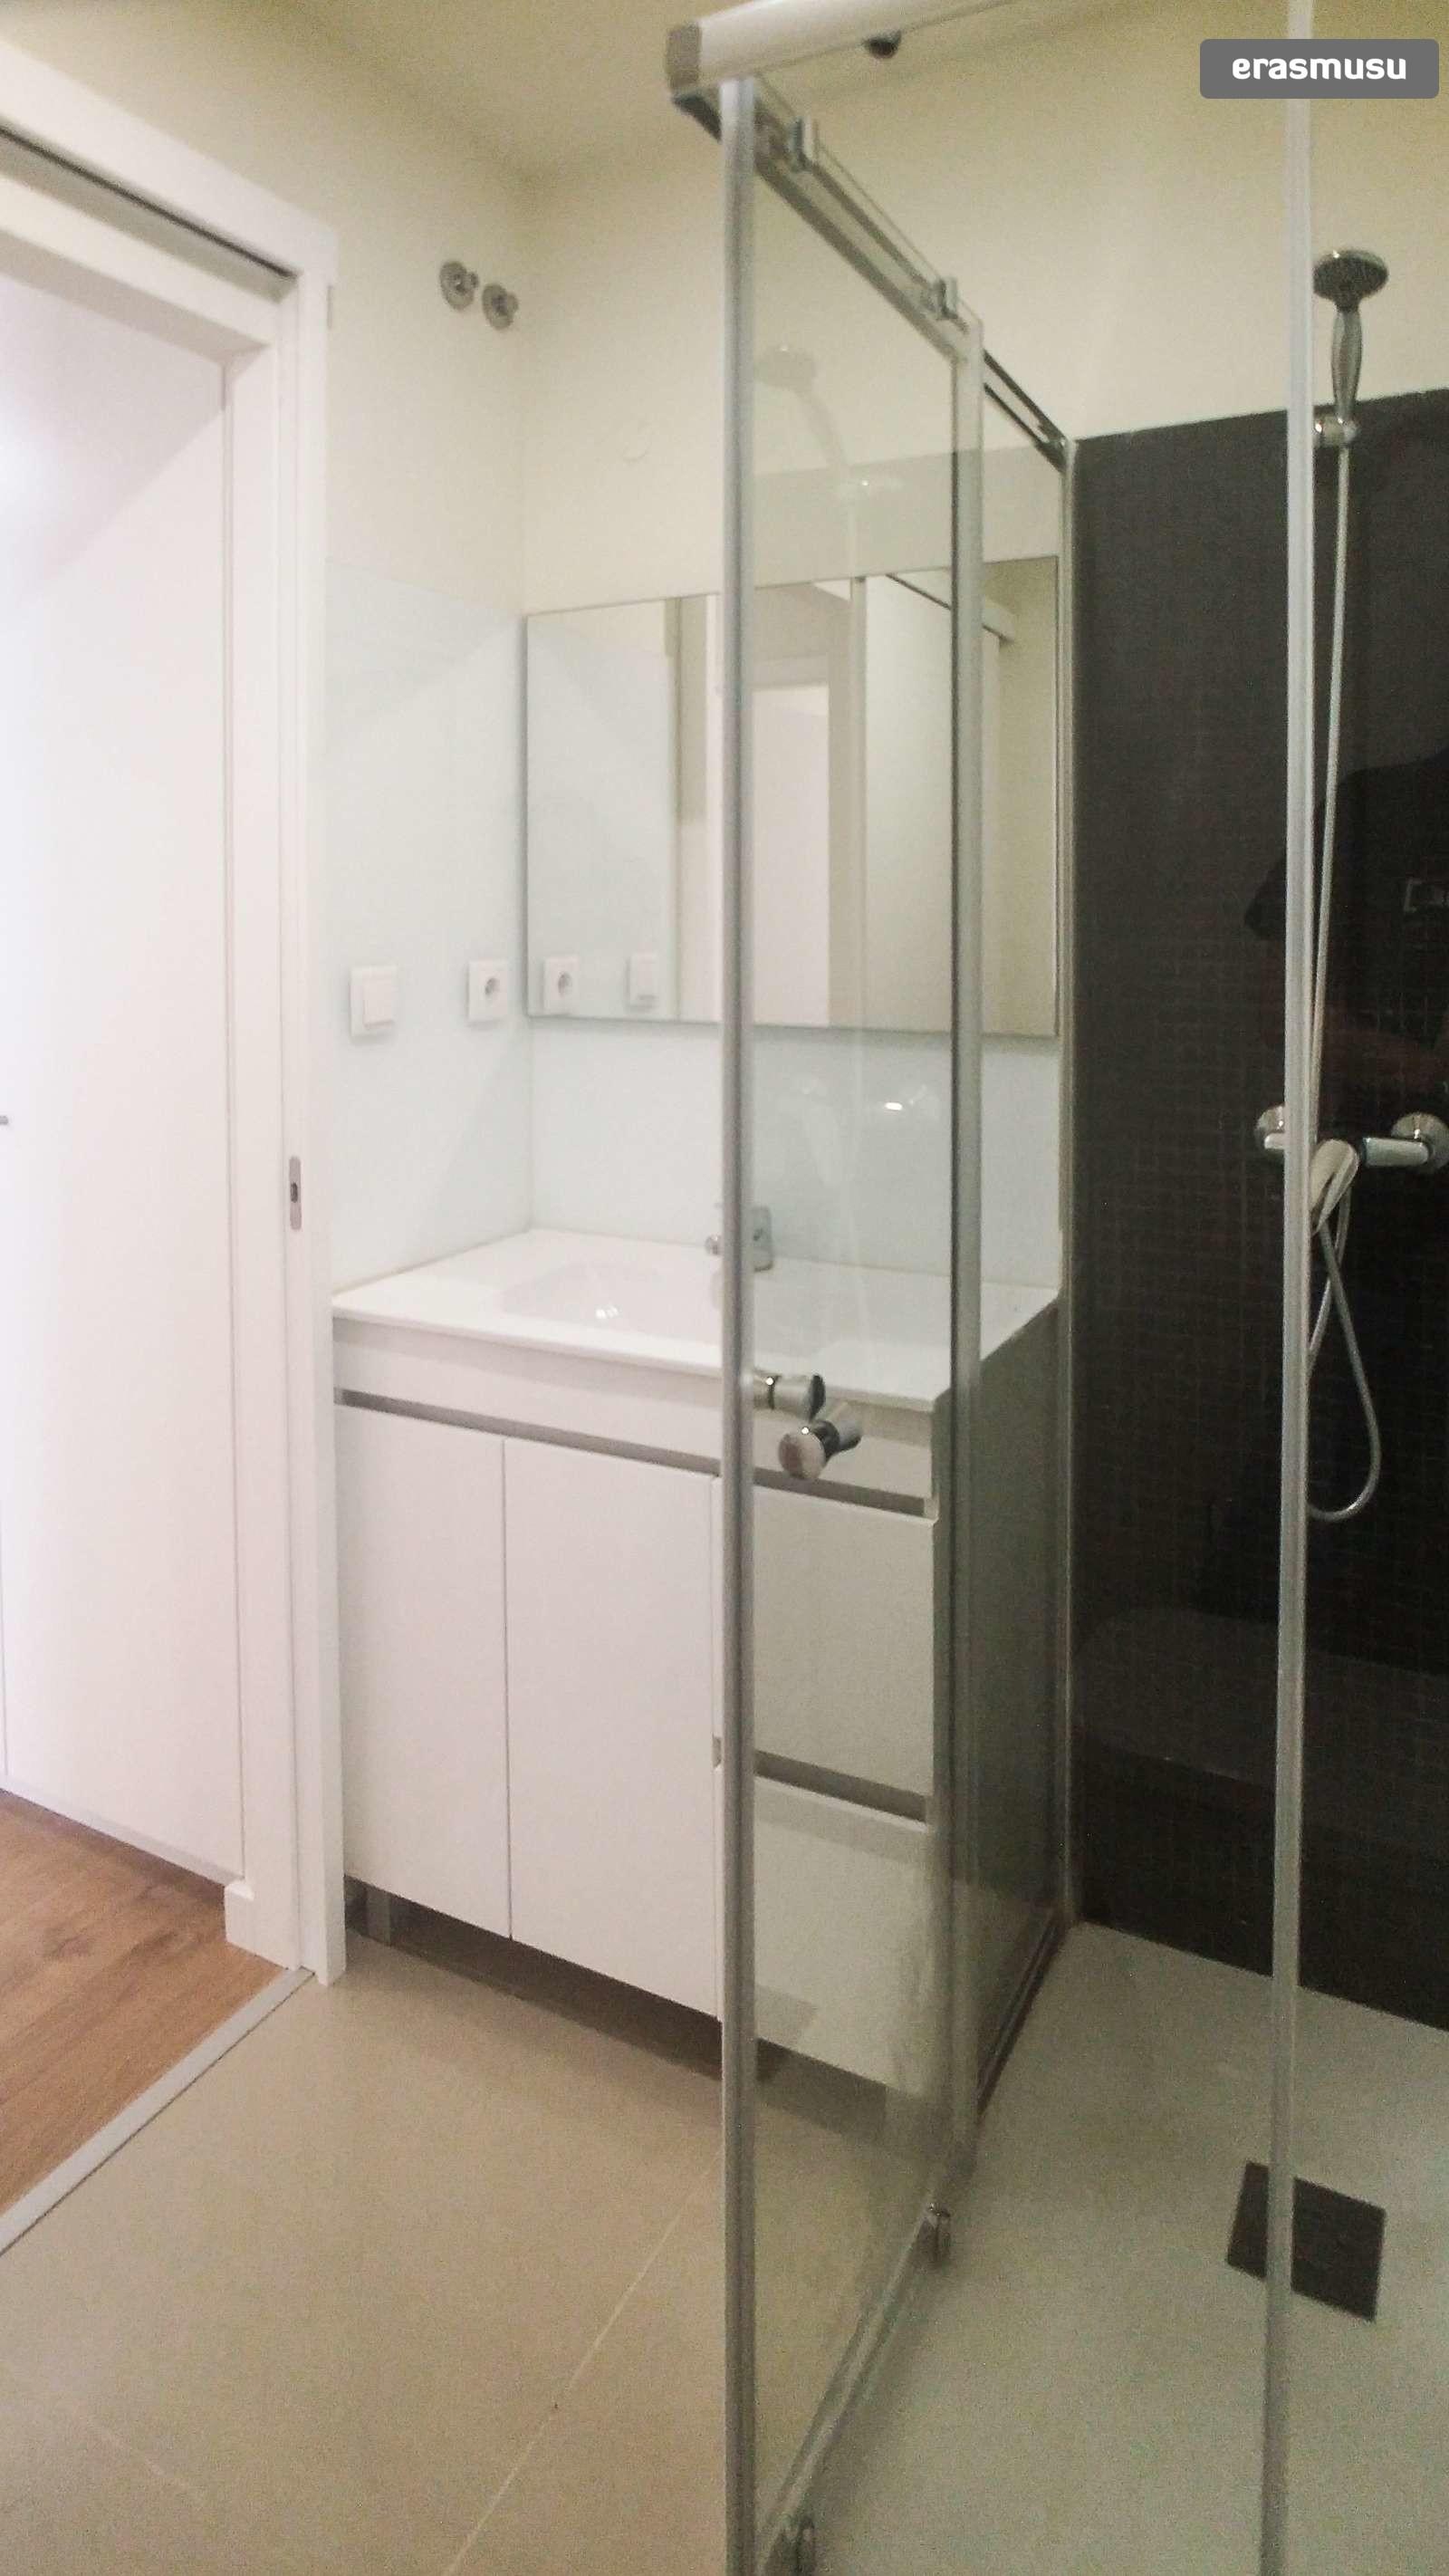 1-bedroom-apartment-rent-santo-ildefonso-4995ebee7da7f0f267a113a